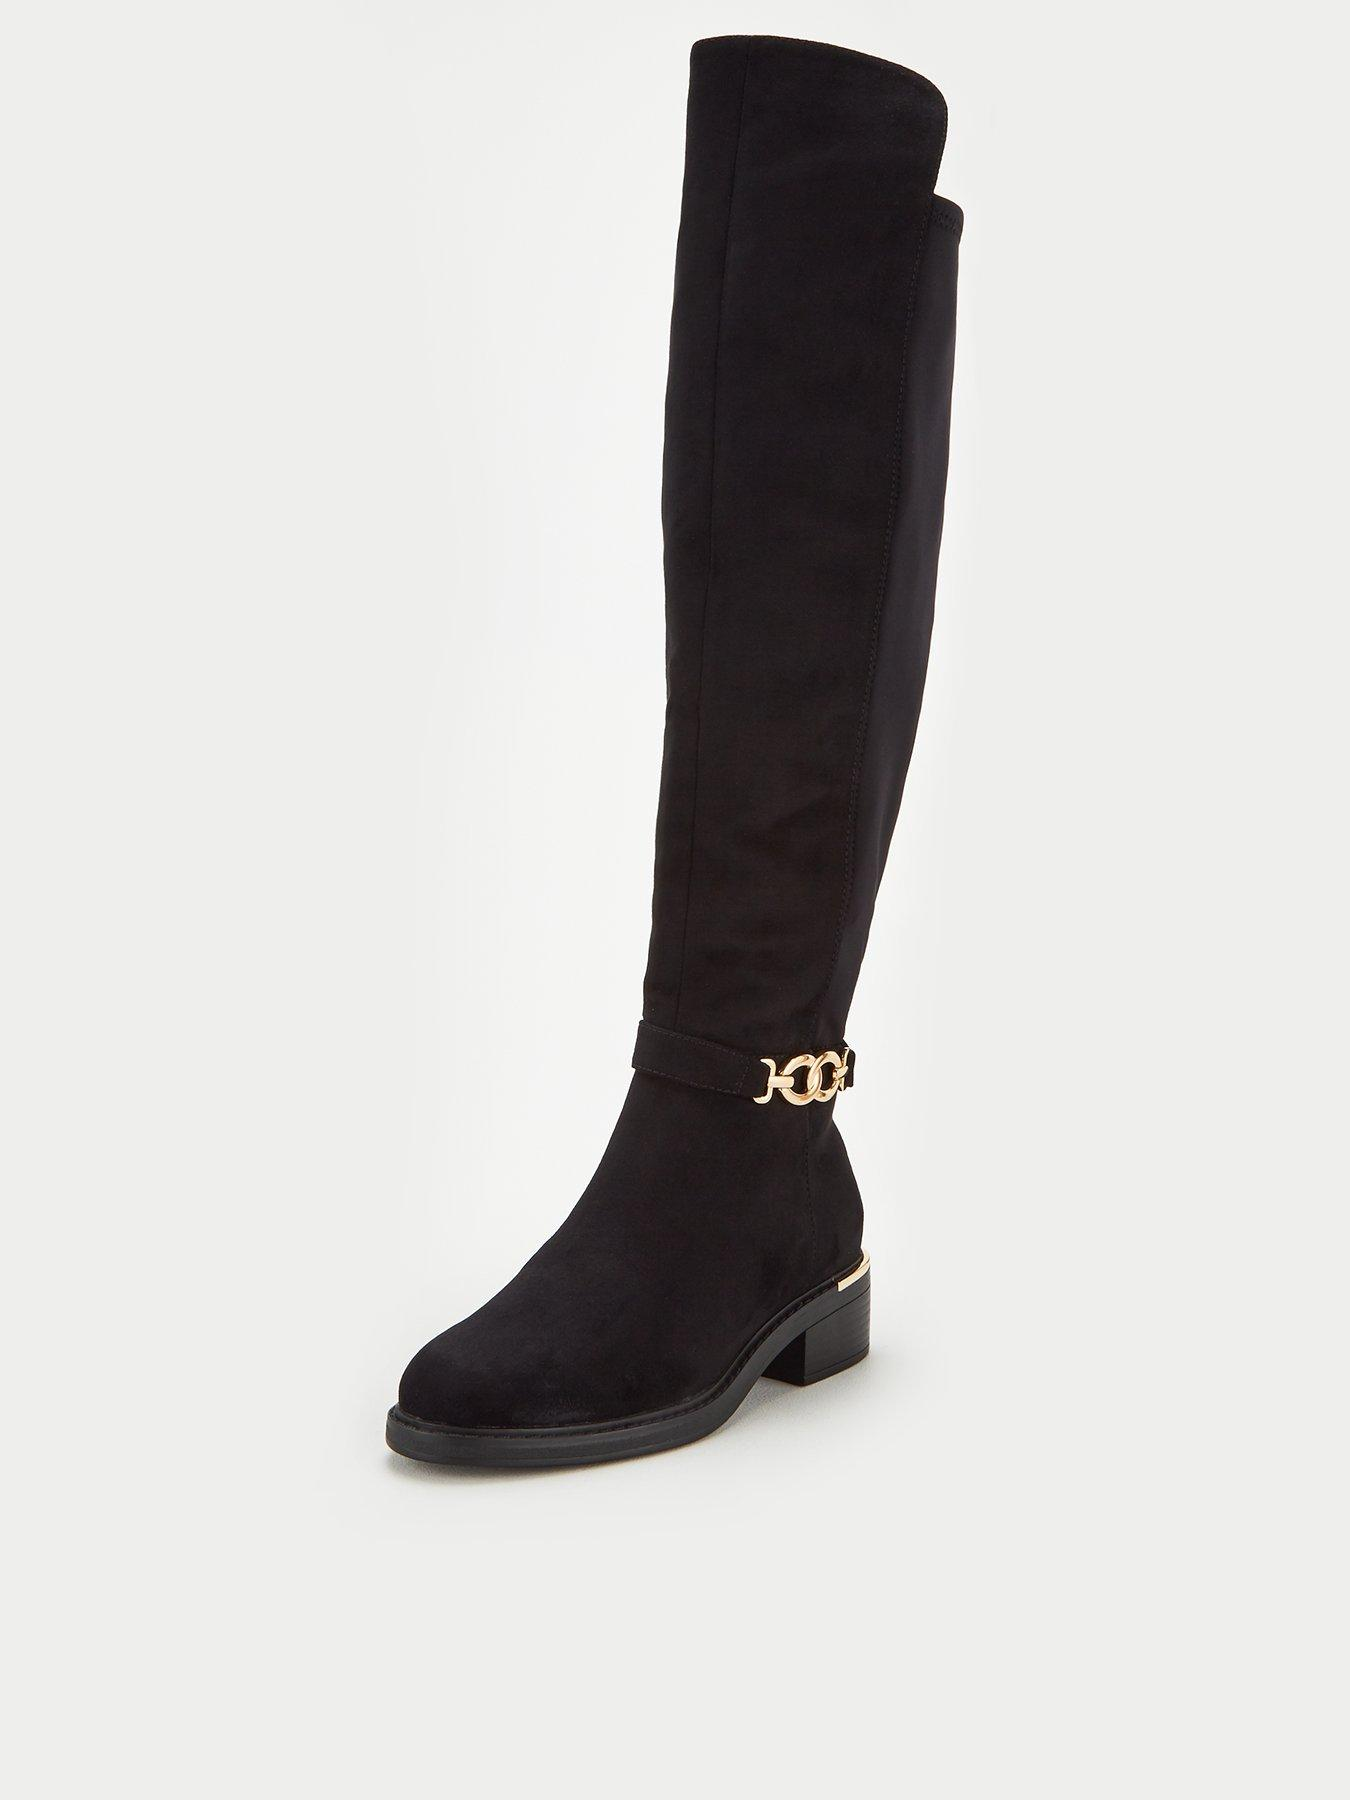 Over The Knee Boots | Women's Footwear